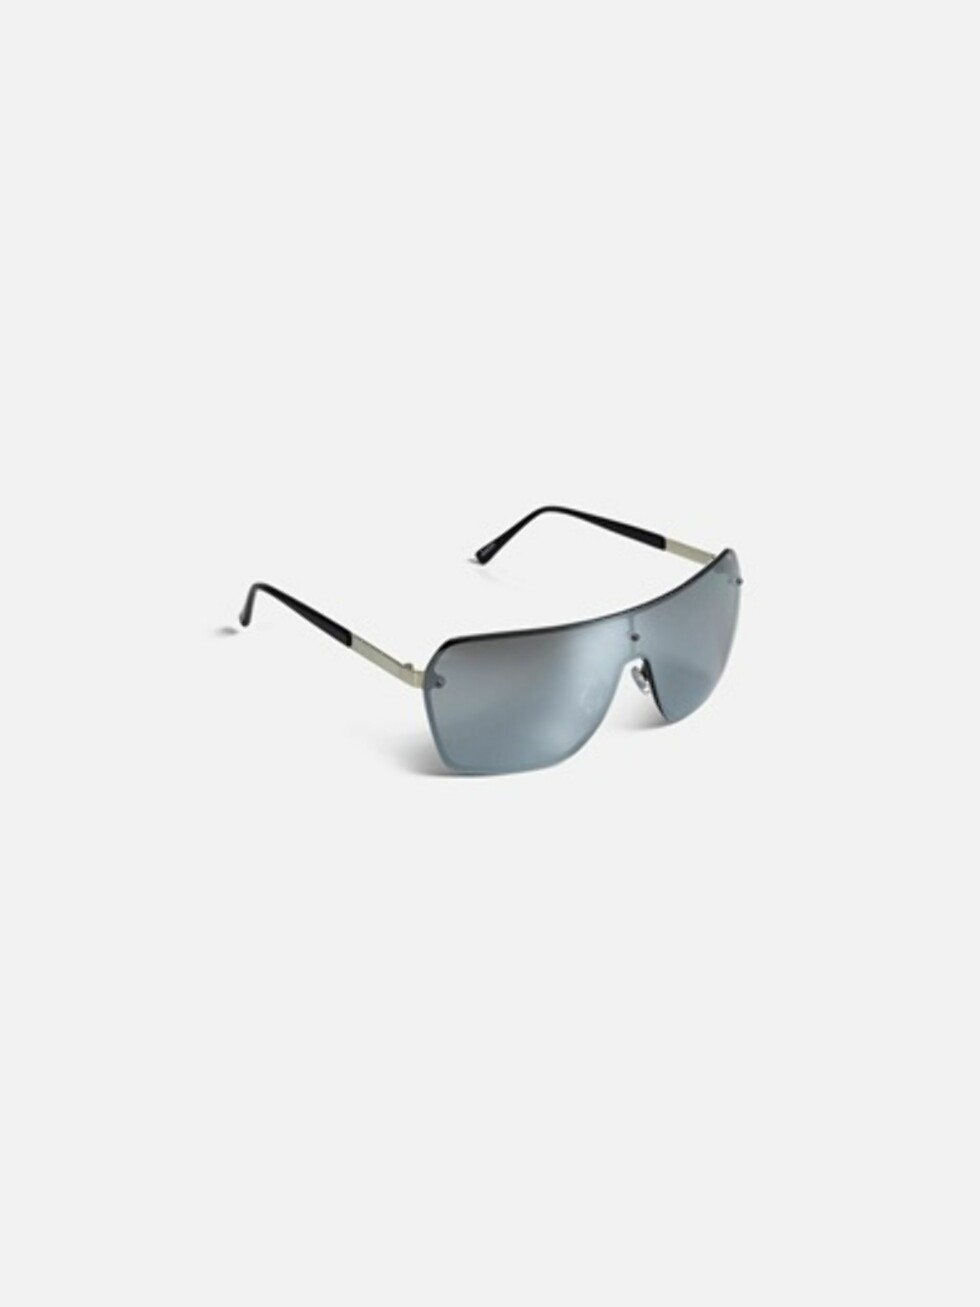 Solbriller fra Bik Bok   kr 129   https://bikbok.com/no/7194434_F990